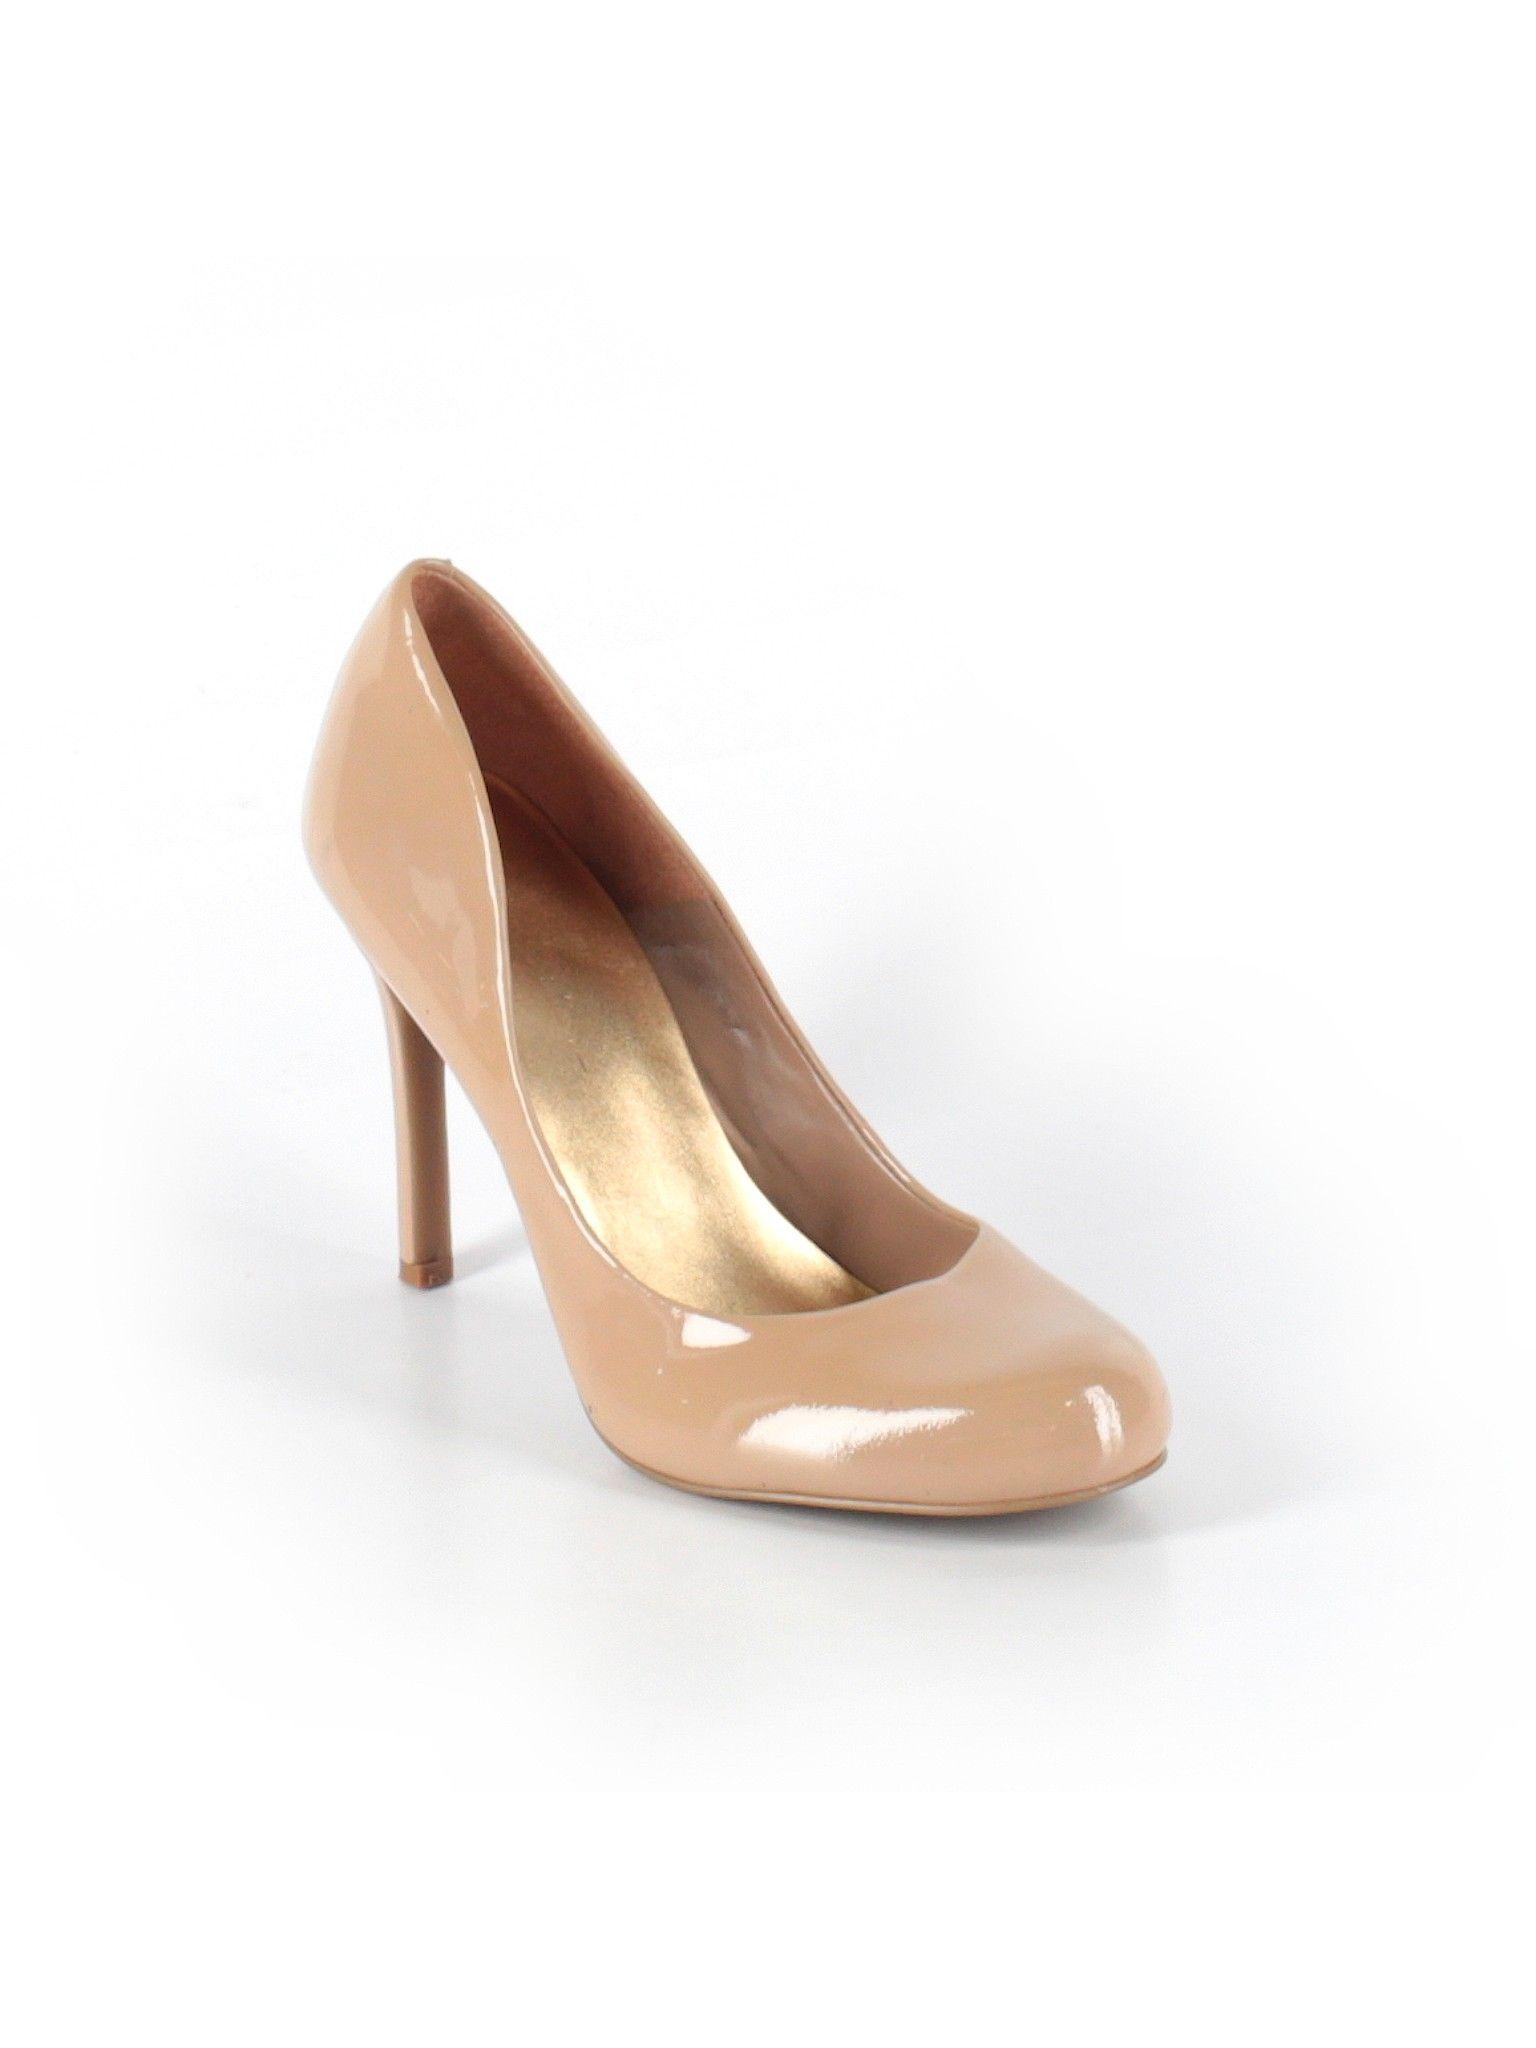 cd0c5b301513 Jessica Simpson Heels  Size 11.00 Tan Women s Clothing -  27.99 ...